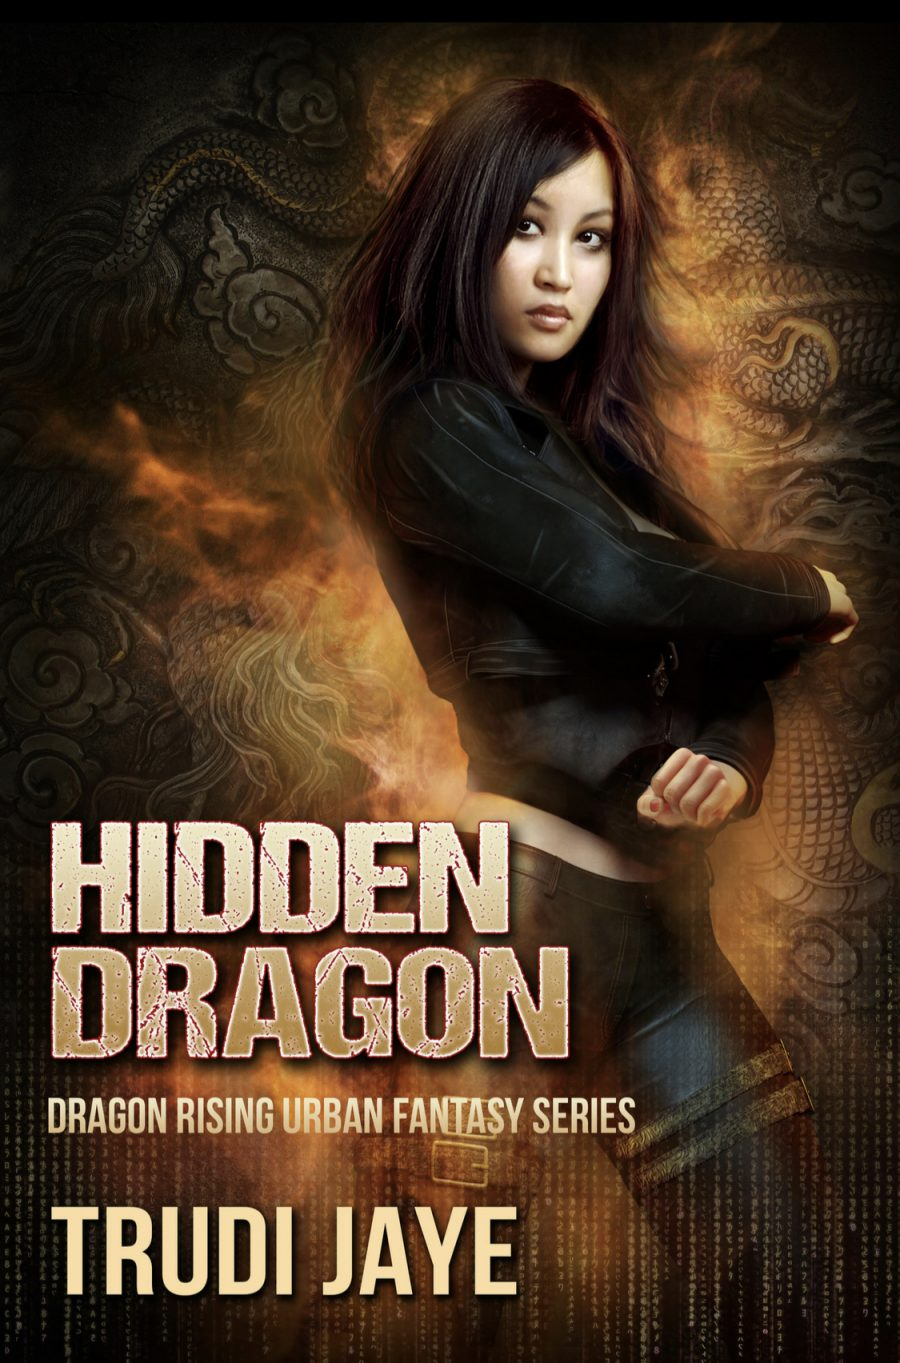 Hidden Dragon by Trudi Jaye - A Book Review #BookReview #UrbanFantasy #UF #Dragons #Magic #War #4Stars #KindleUnlimited #KU